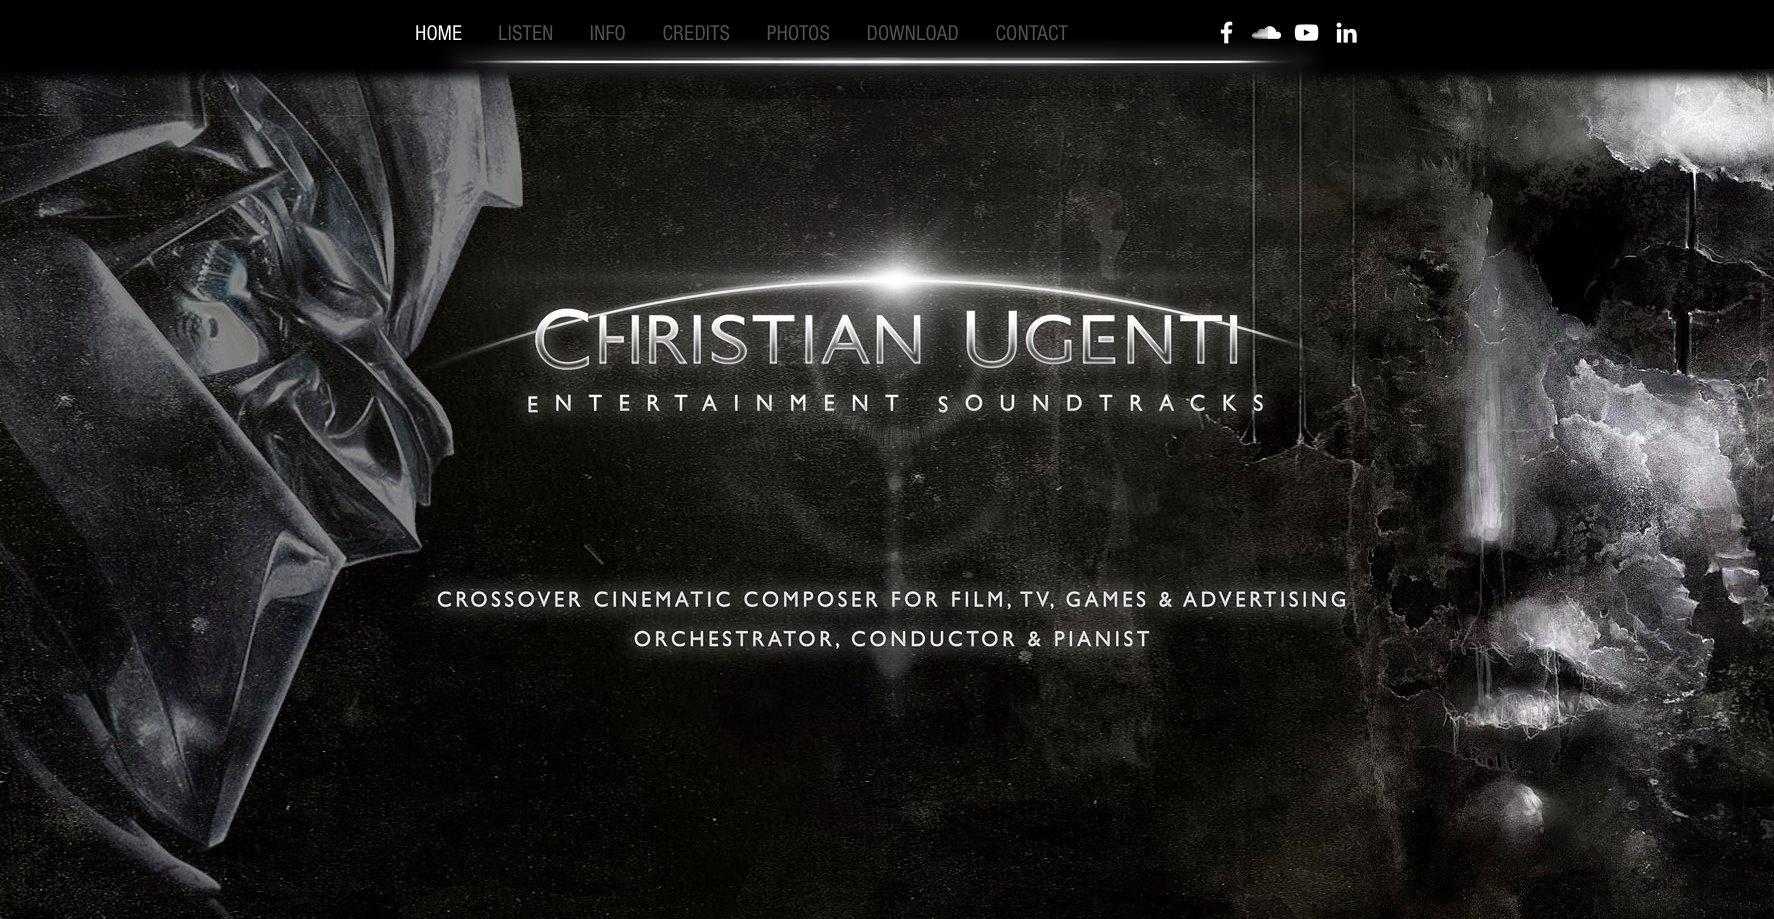 christian-ugenti | INFO